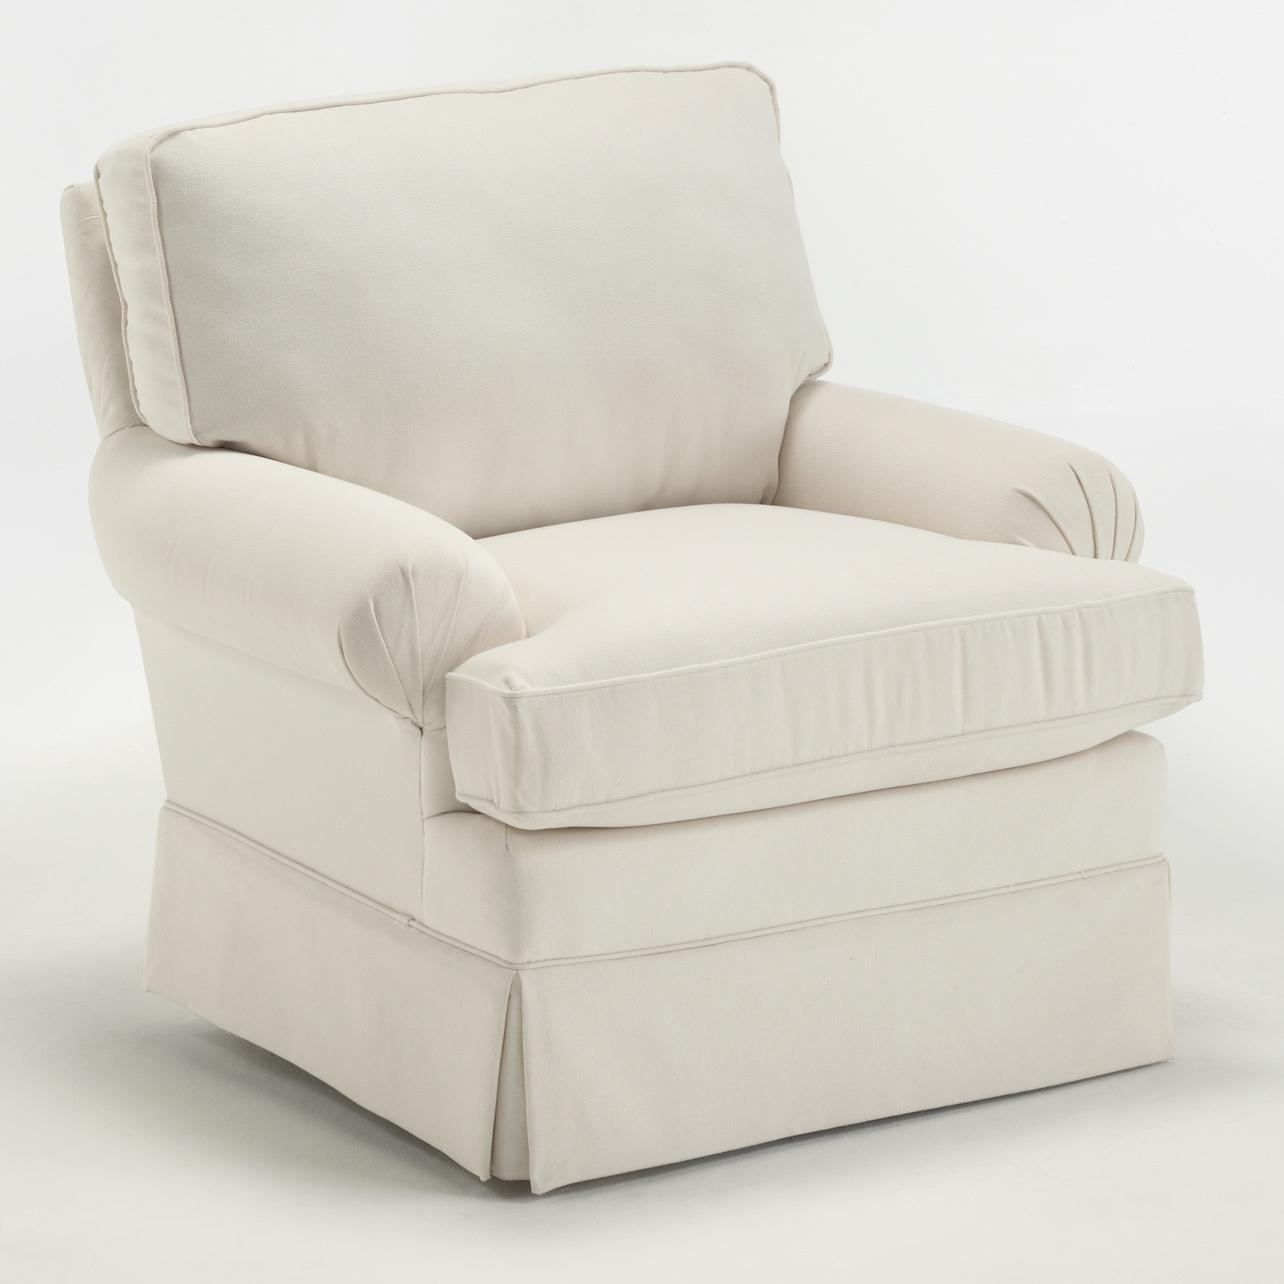 Ordinaire Best Home Furnishings Kamilla Kamilla Skirted Club Chair